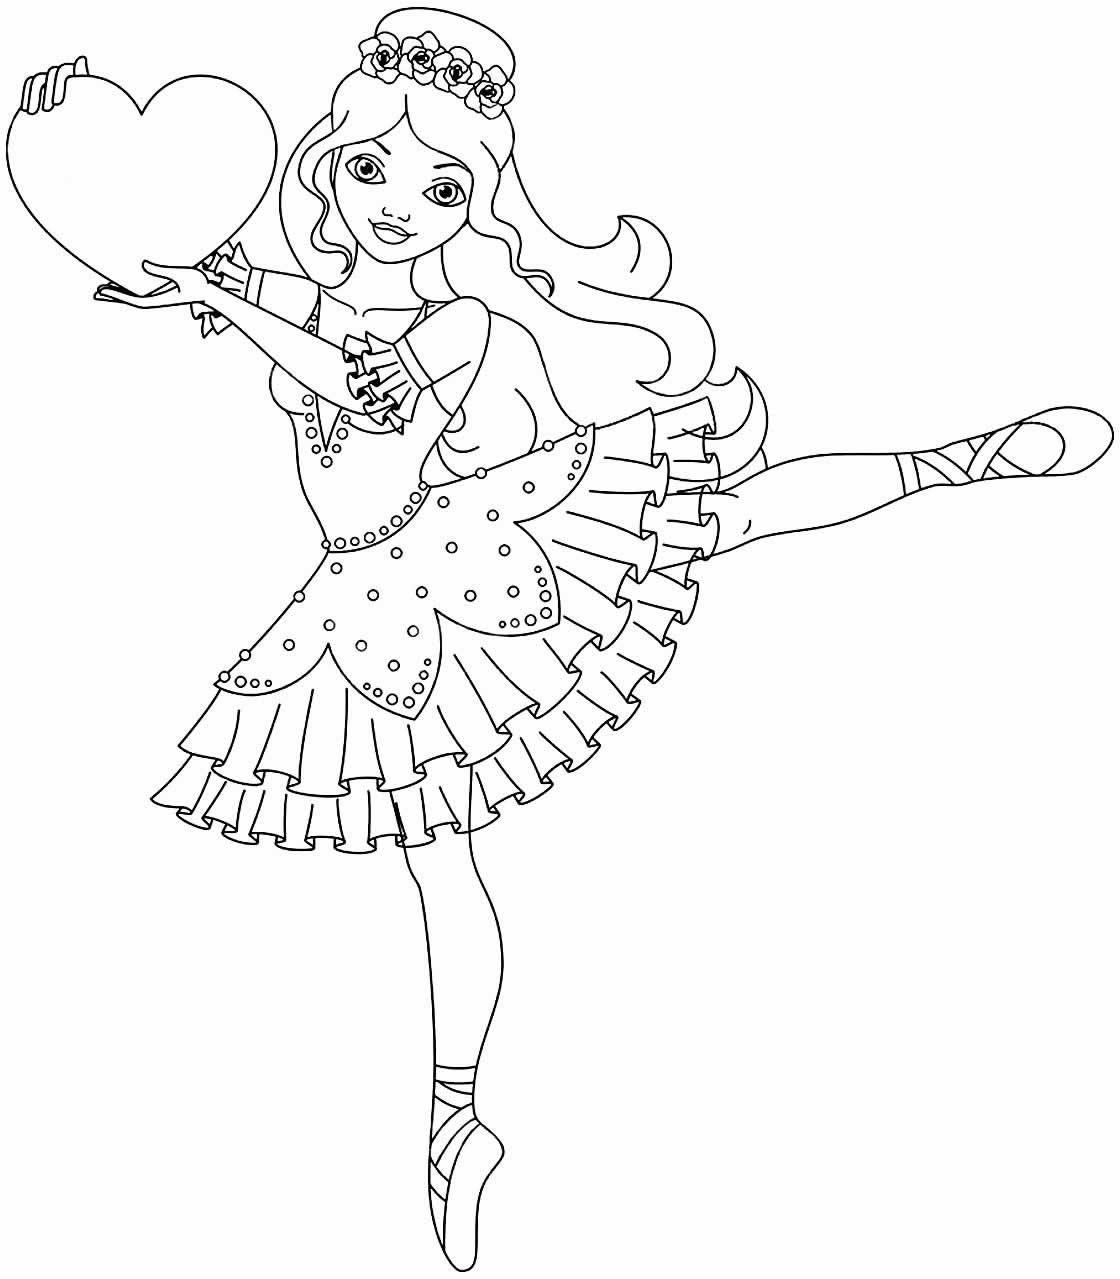 Desenho para pintar de Bailarina